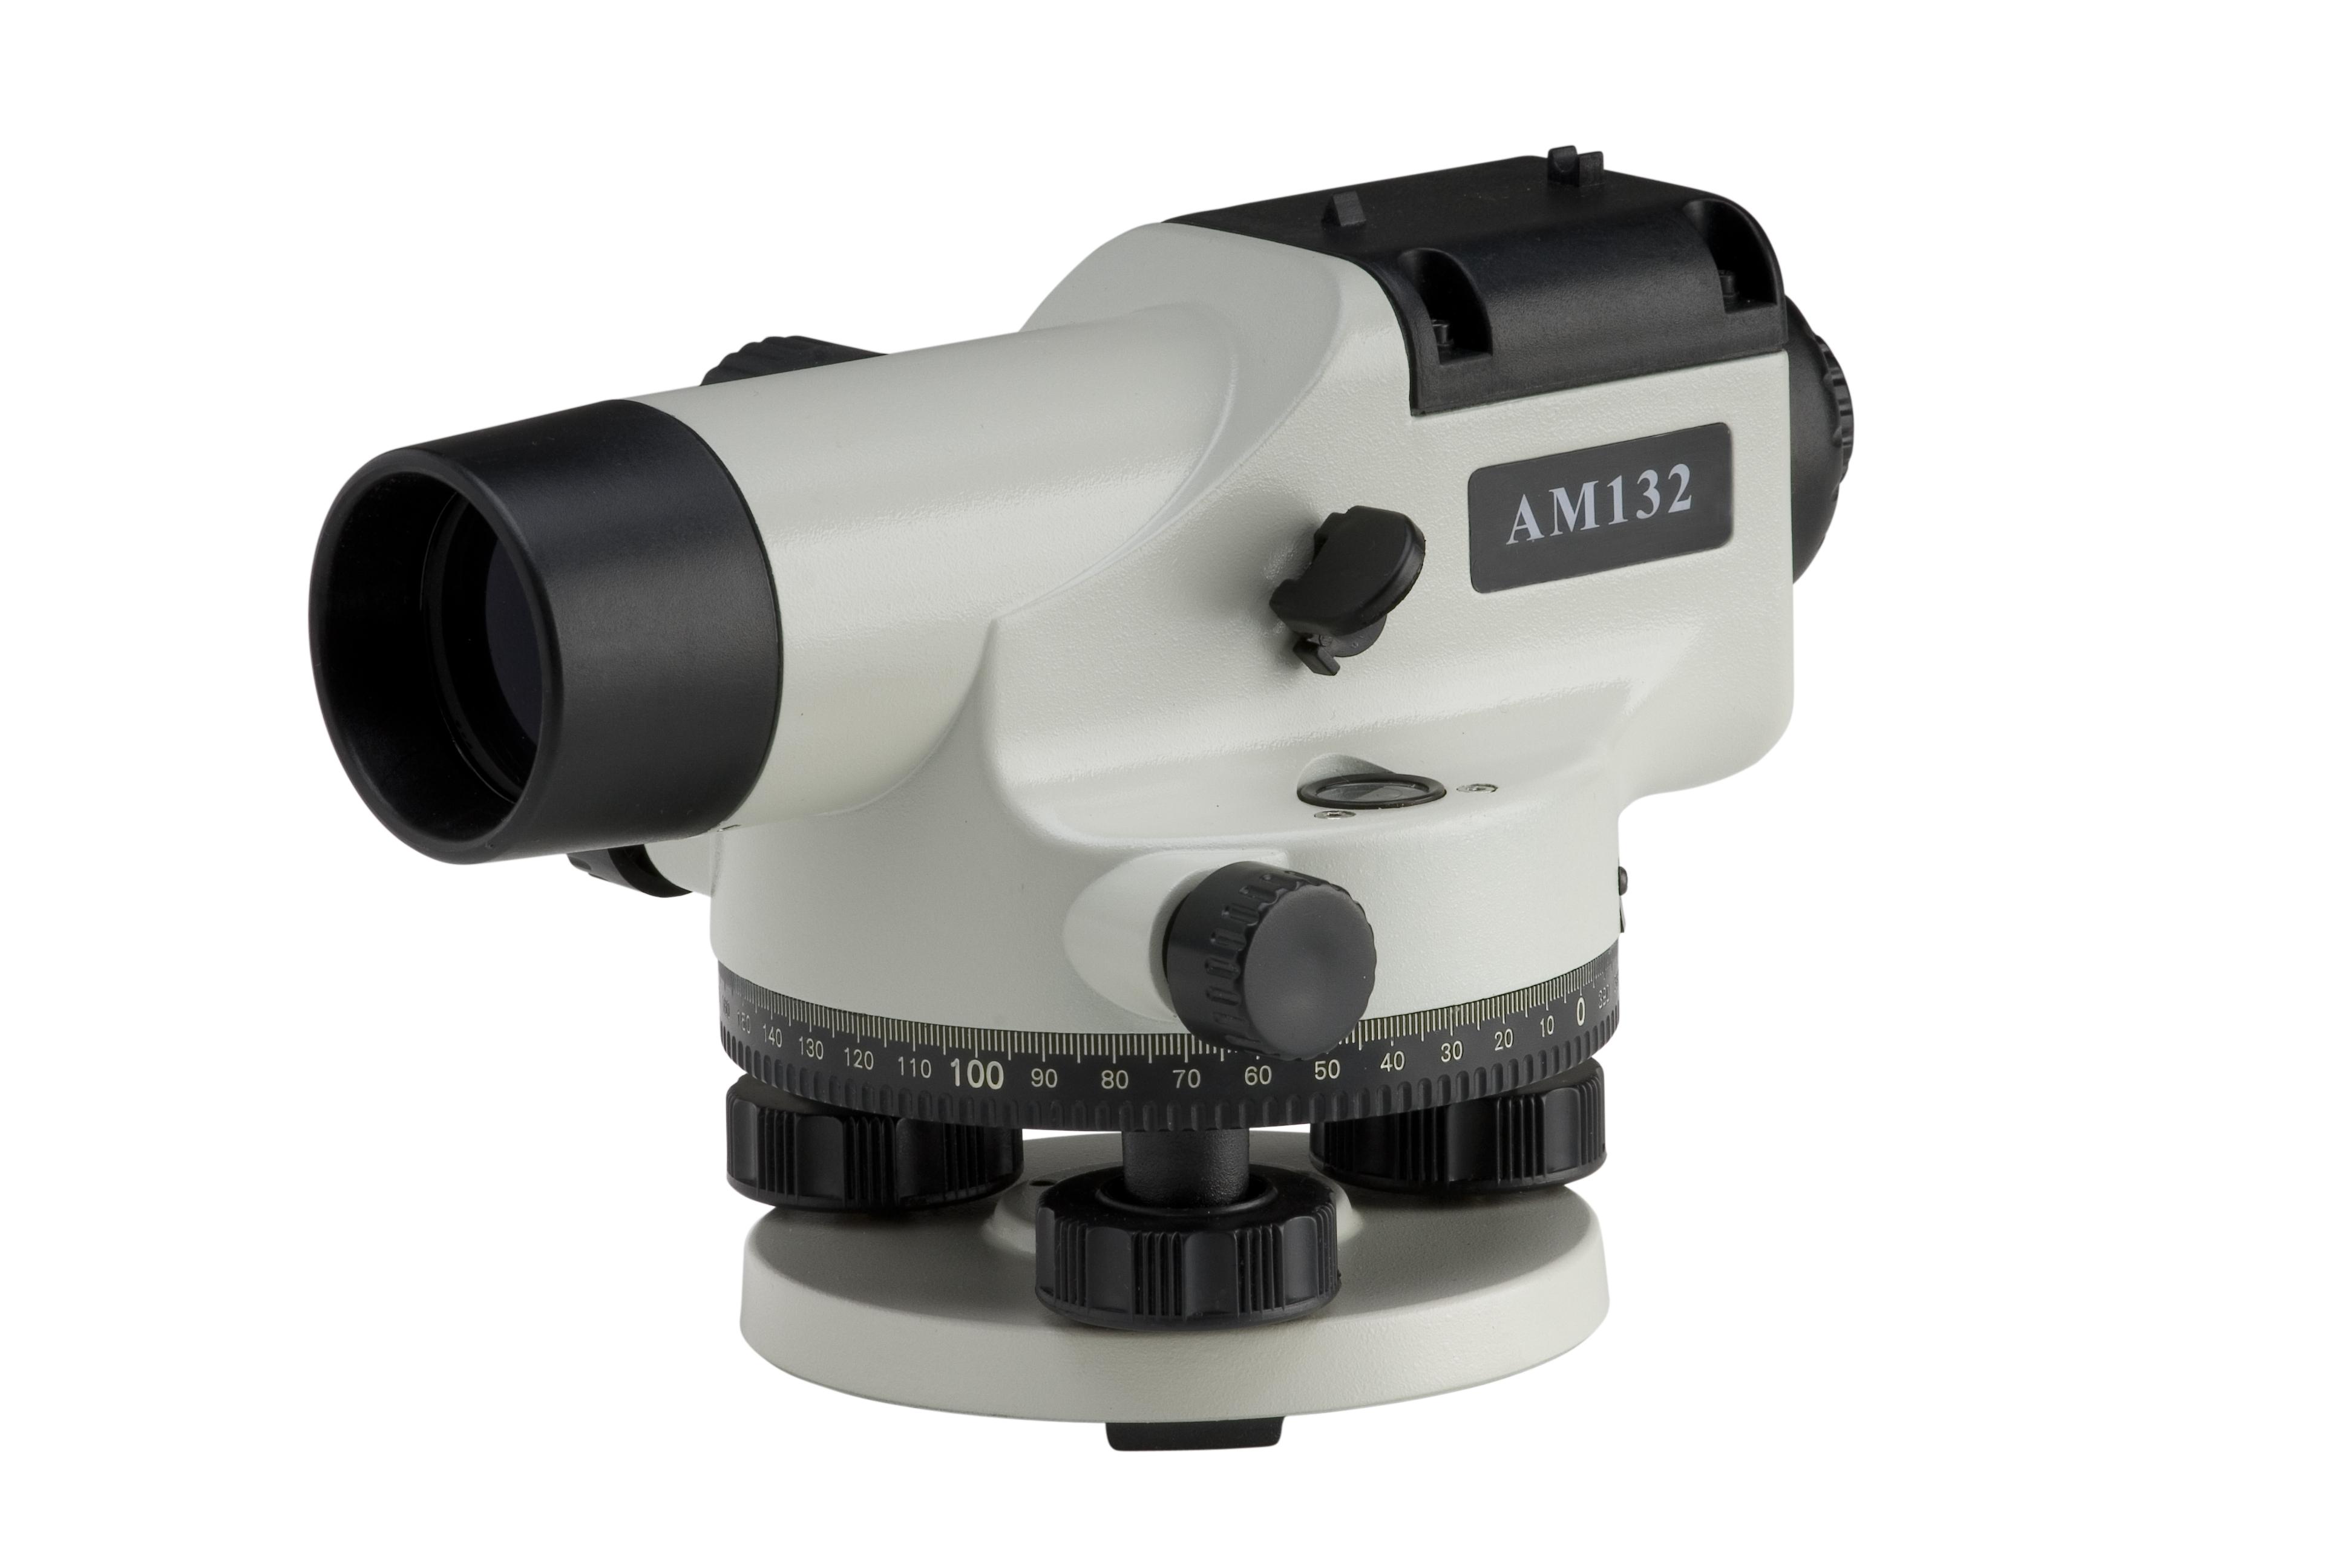 NIVEL AUTOMATICO AM-132 FORETECH